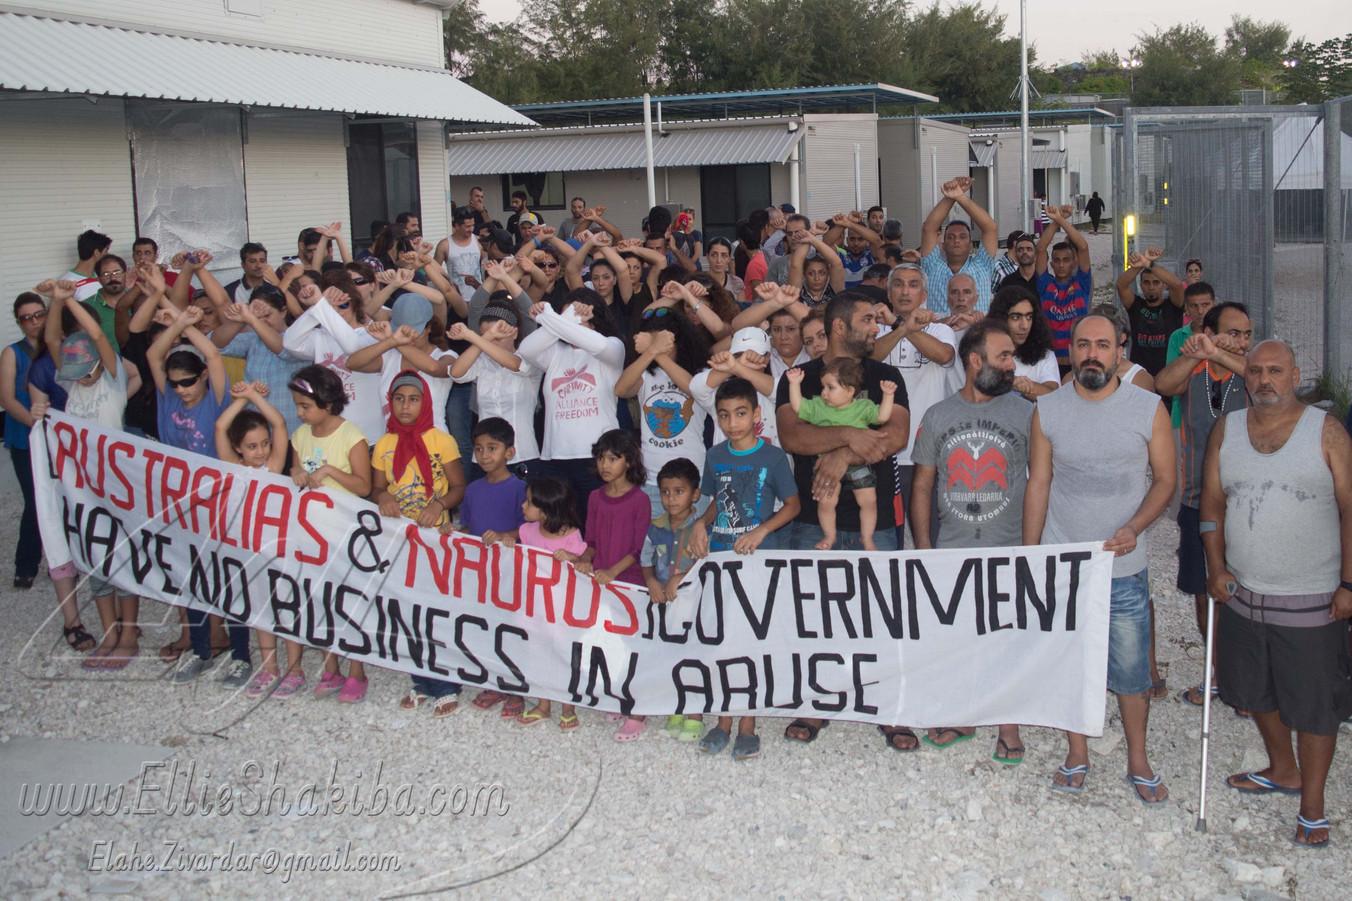 Protest-06.jpg